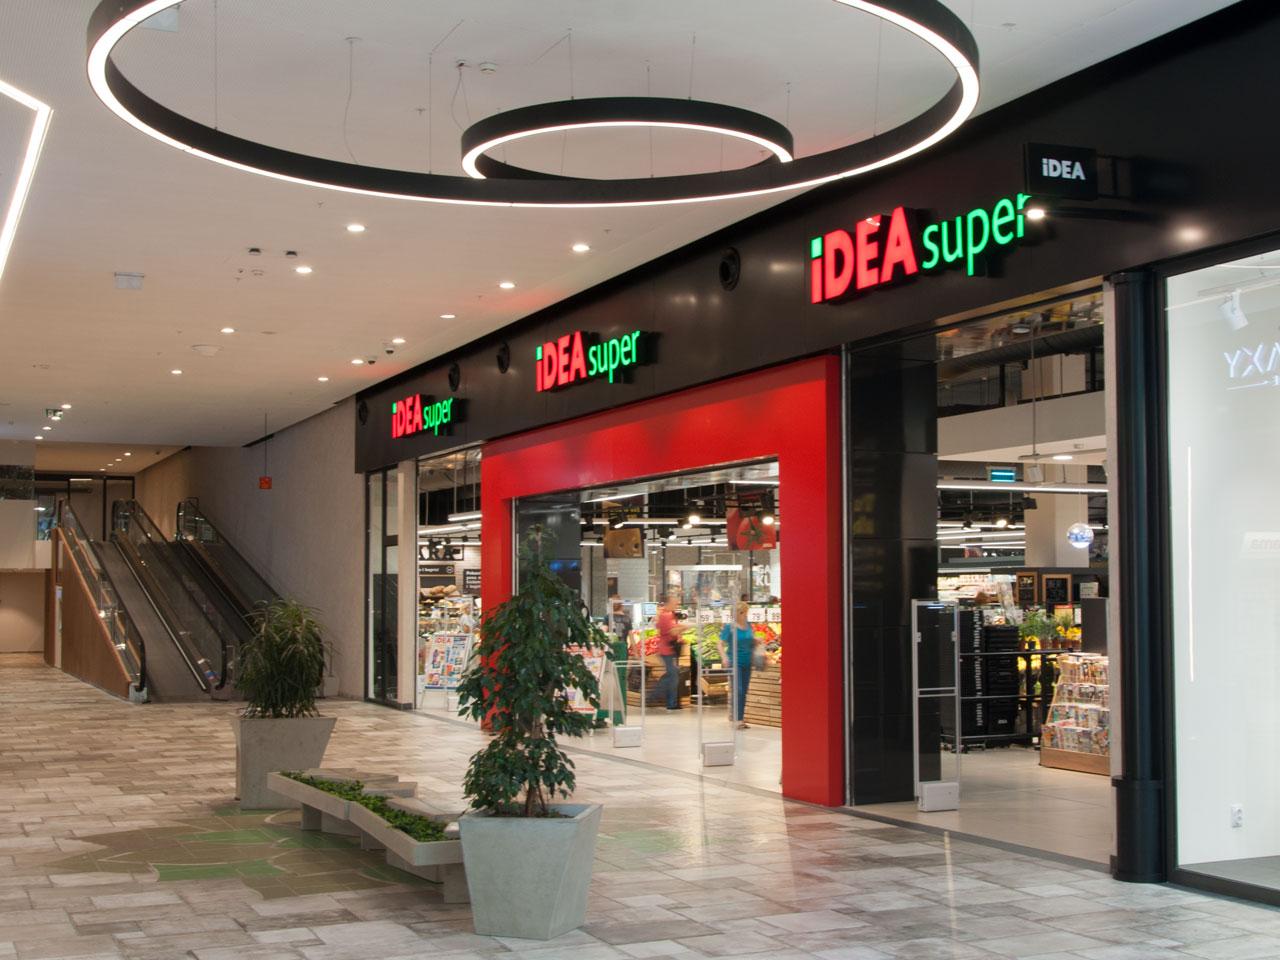 New IDEA SUPER opened in the Big Fashion Center - Karaburma